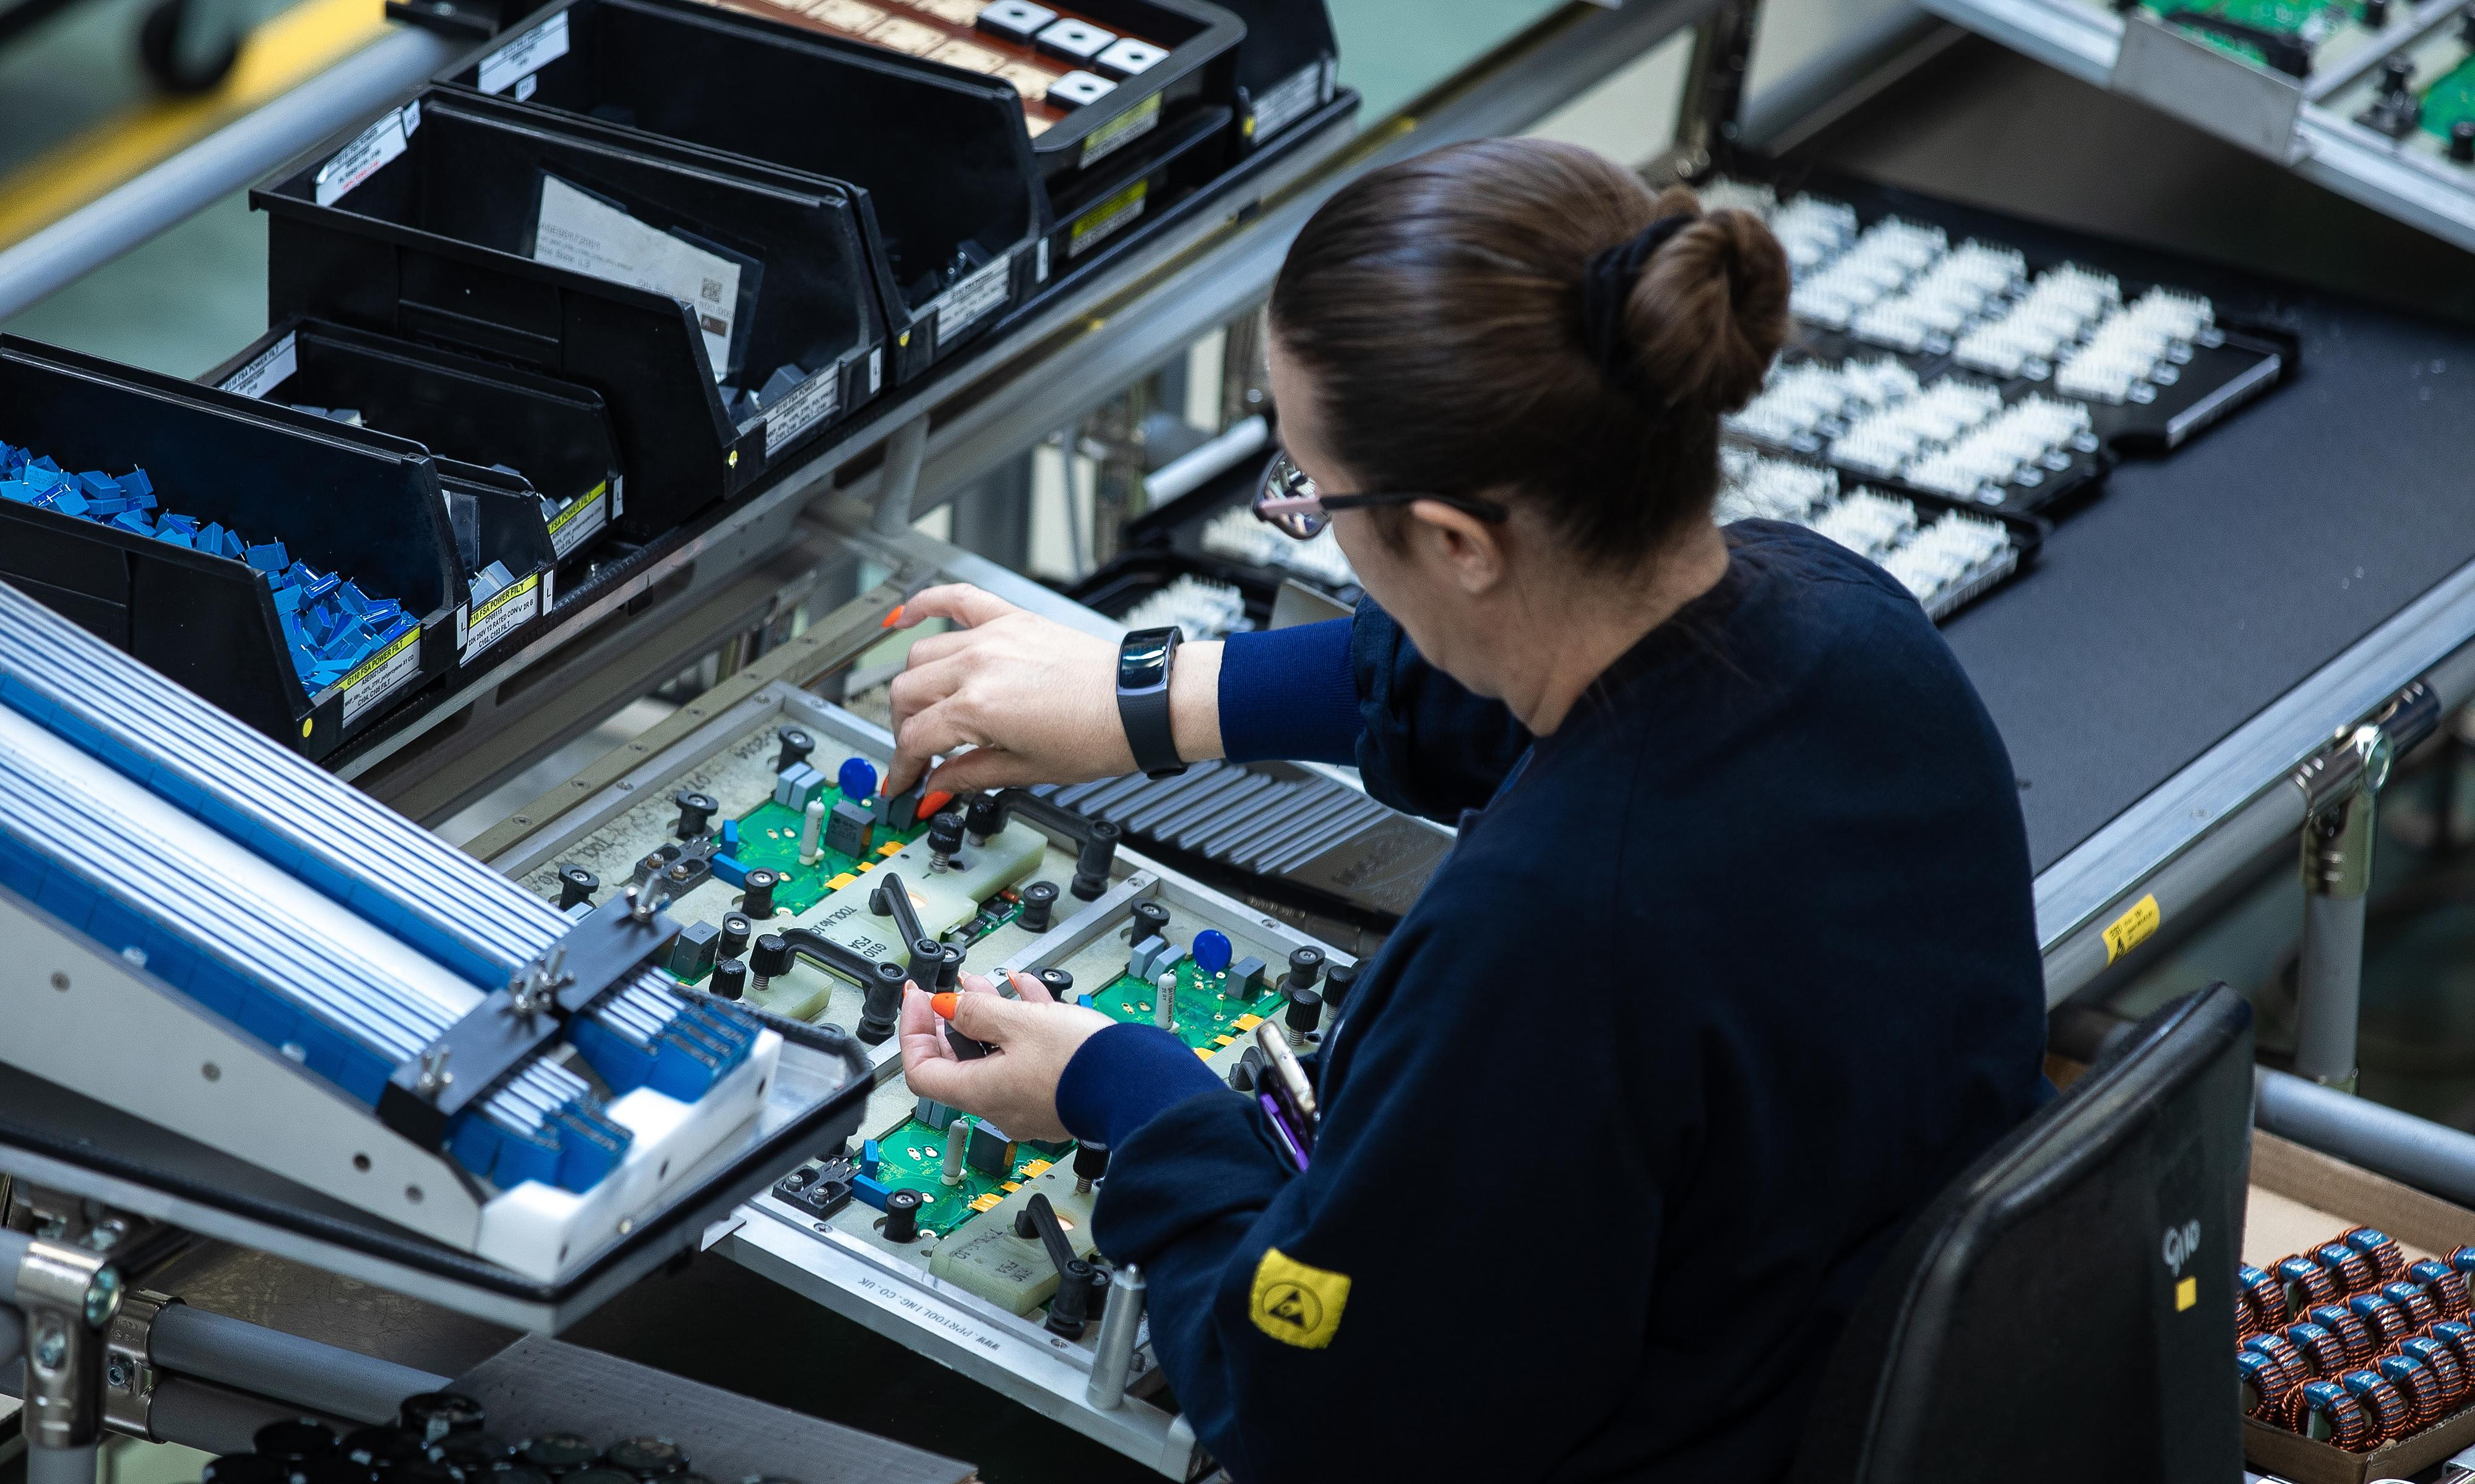 UK factories facing biggest slowdown since financial crisis, says CBI